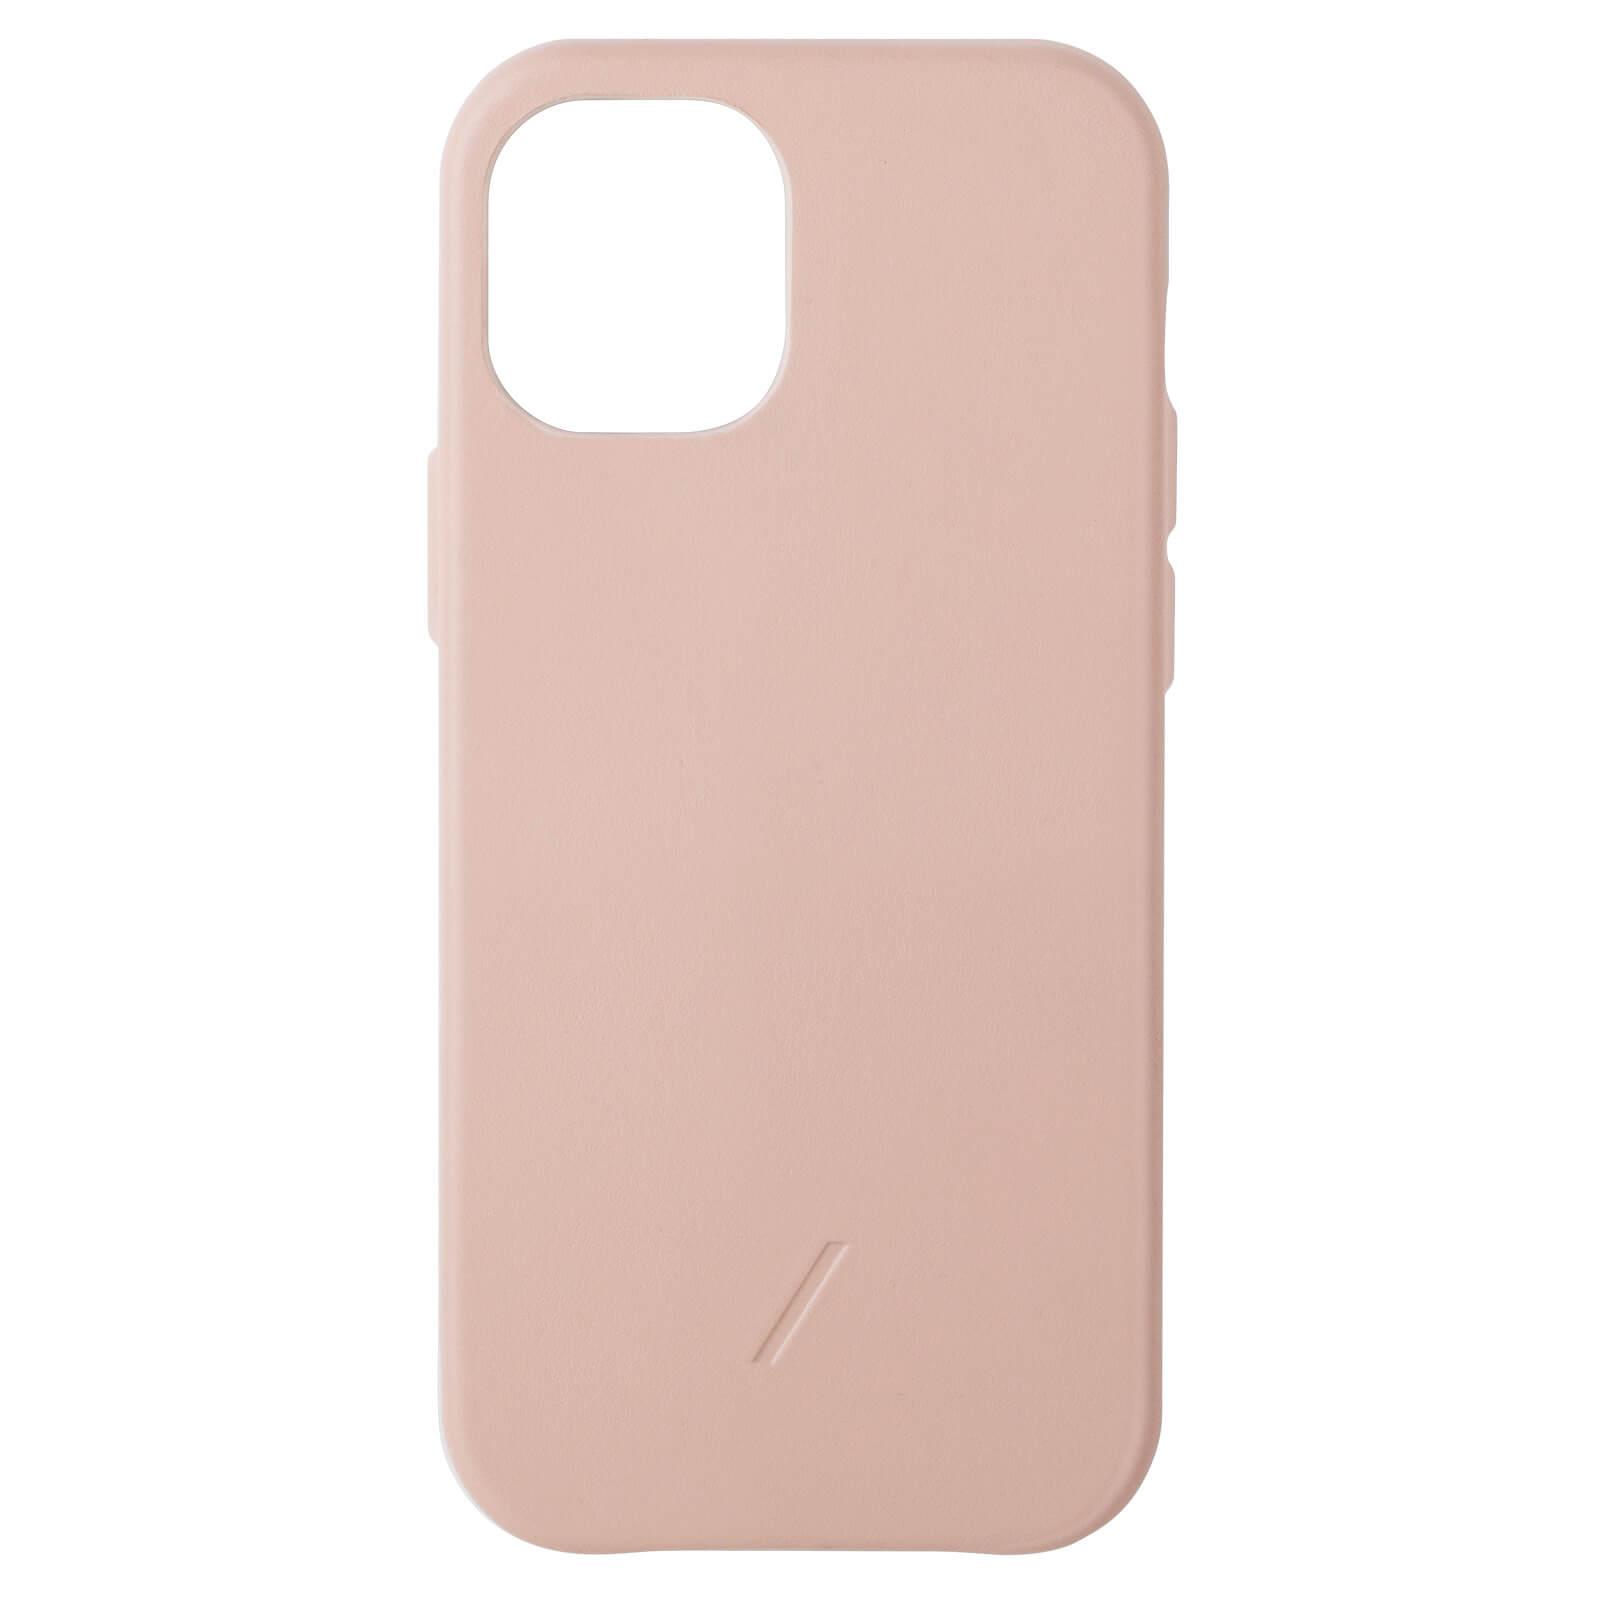 Native Union Clic Classic iPhone Case - Nude - iPhone 12/12 Pro